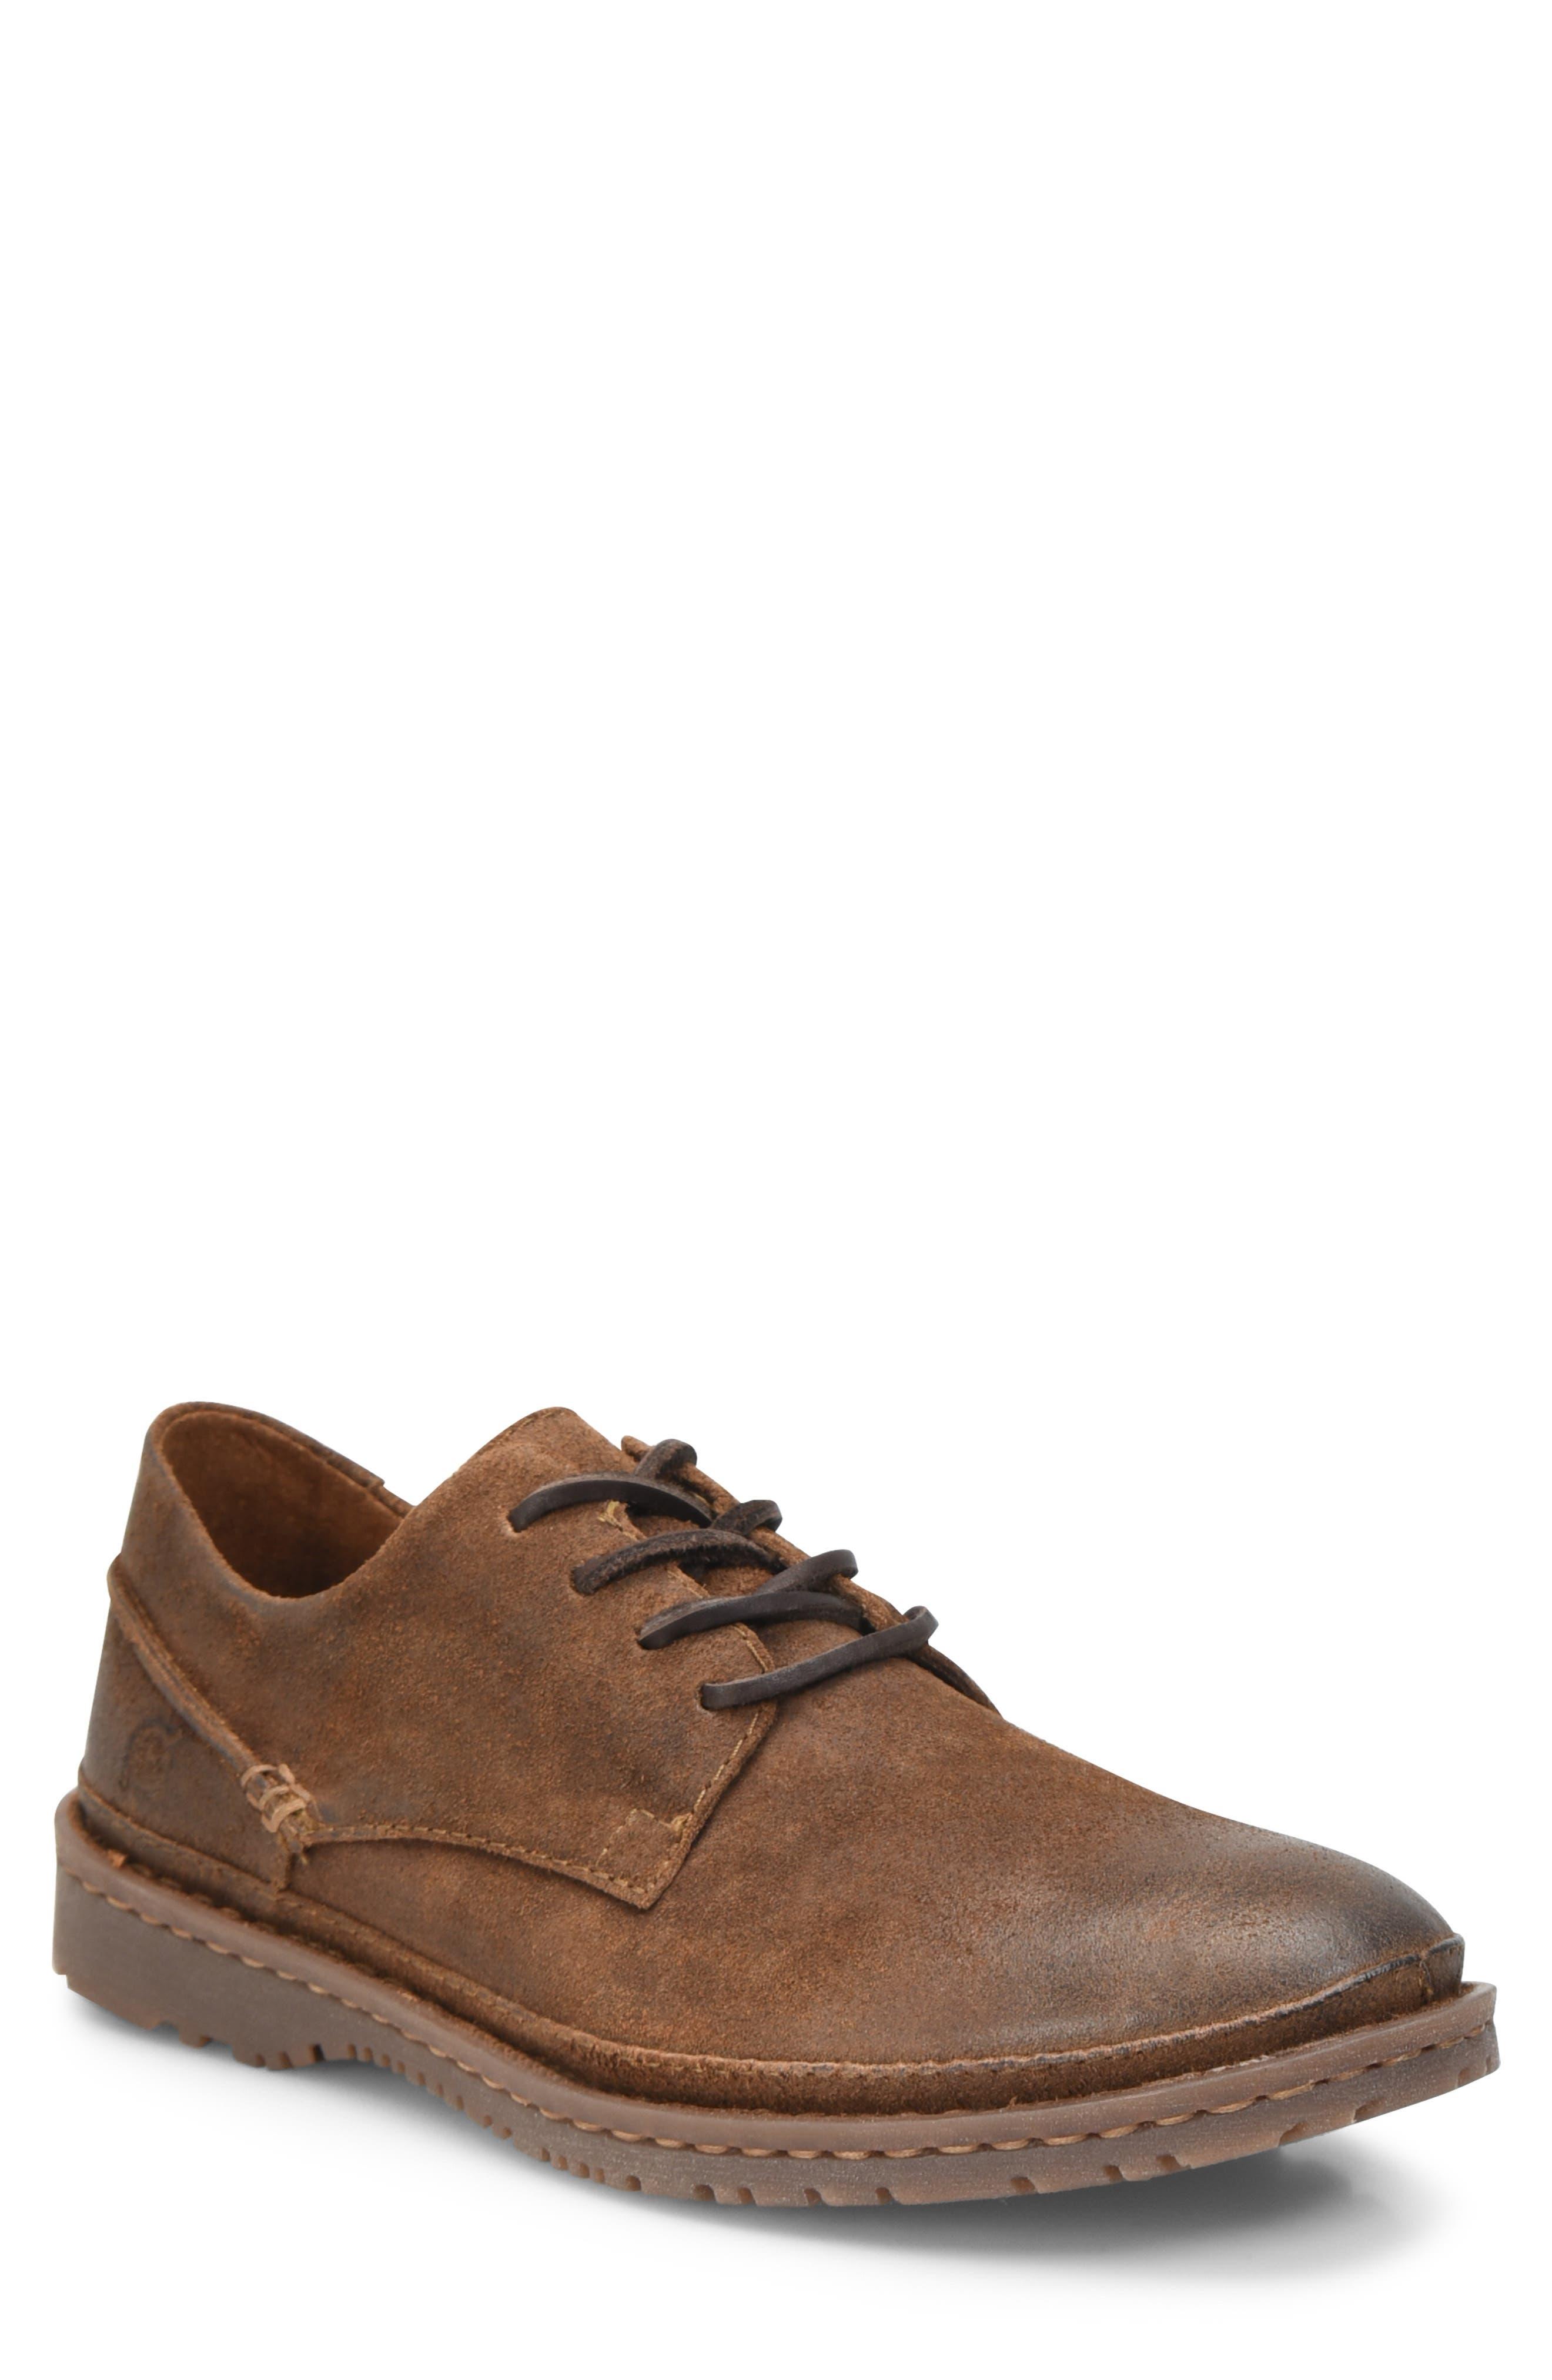 Gilles Plain Toe Derby,                             Main thumbnail 1, color,                             Brown/Brown Leather